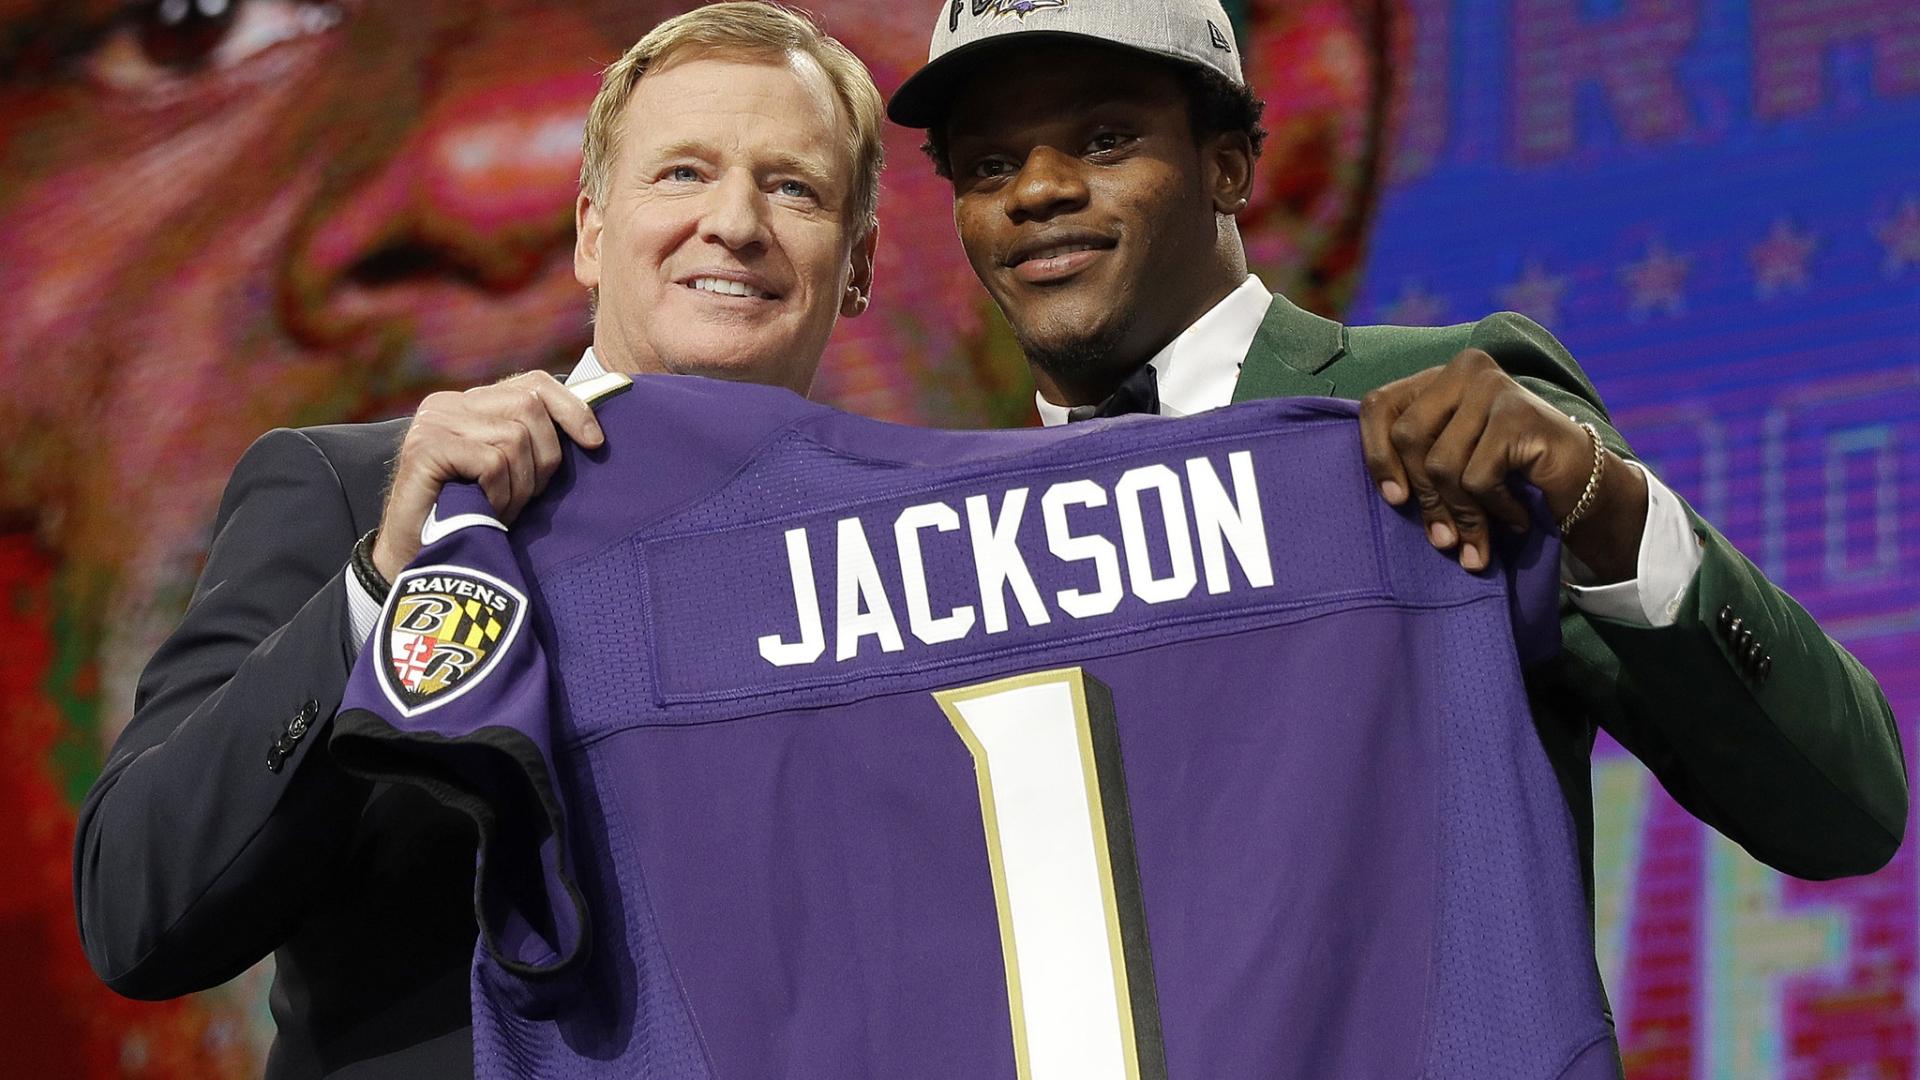 Nfl Draft Ravens Make Qb Lamar Jackson Final Pick Of 1st Round Orlando Sentinel